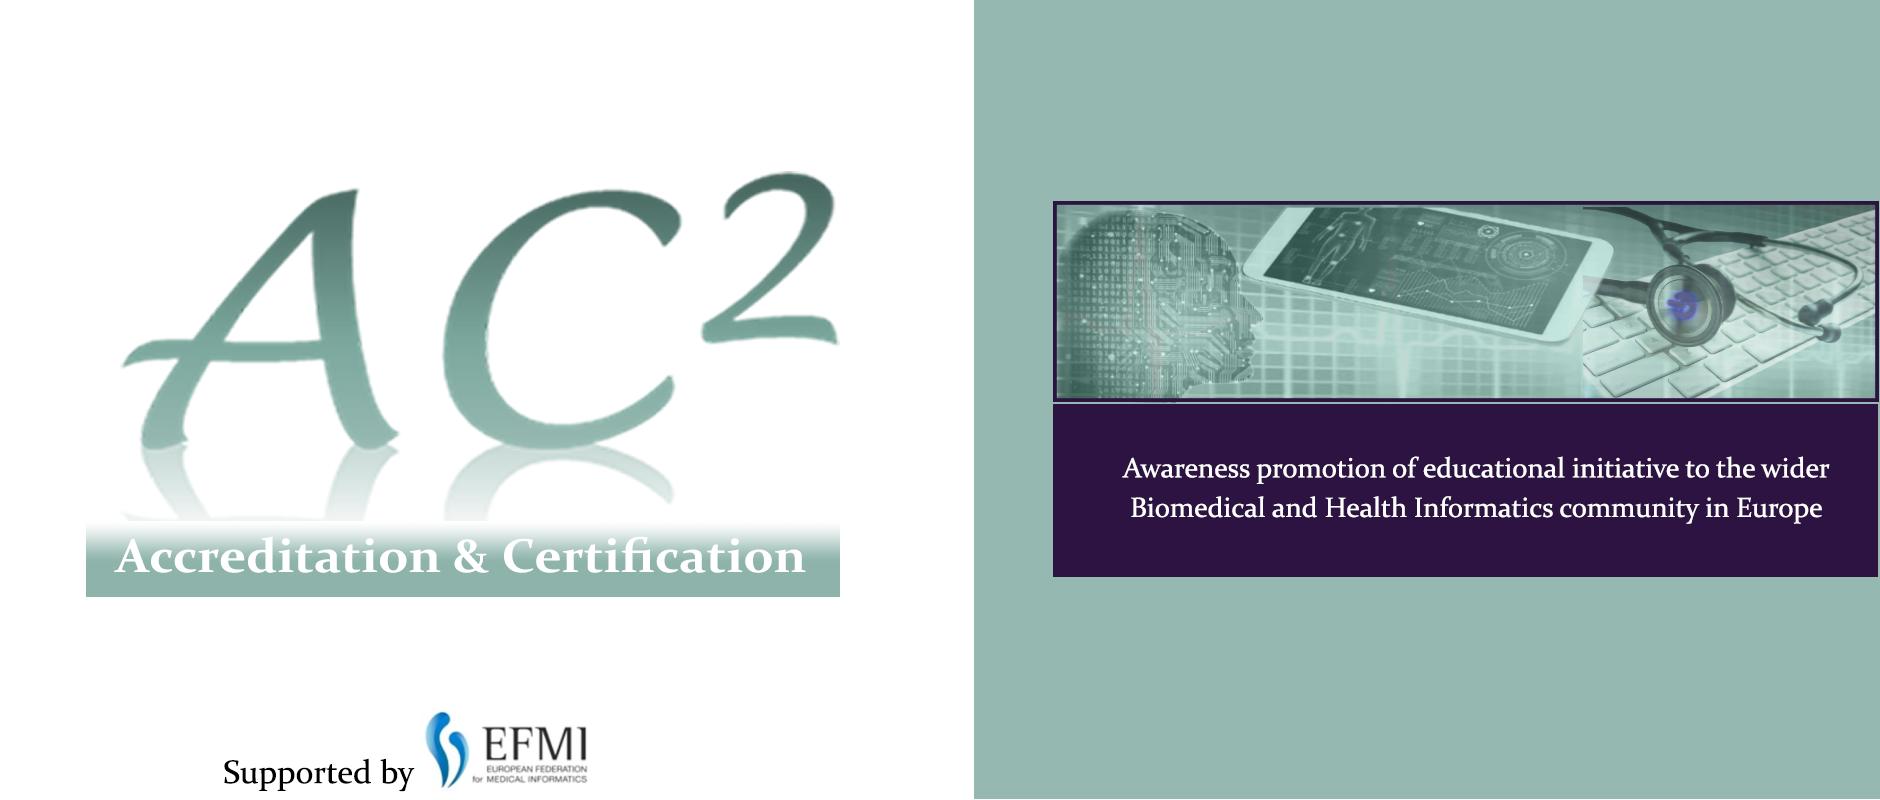 ac2_home_logo3E9602D20-40F7-92C6-B8C7-64F5429C9F1A.png